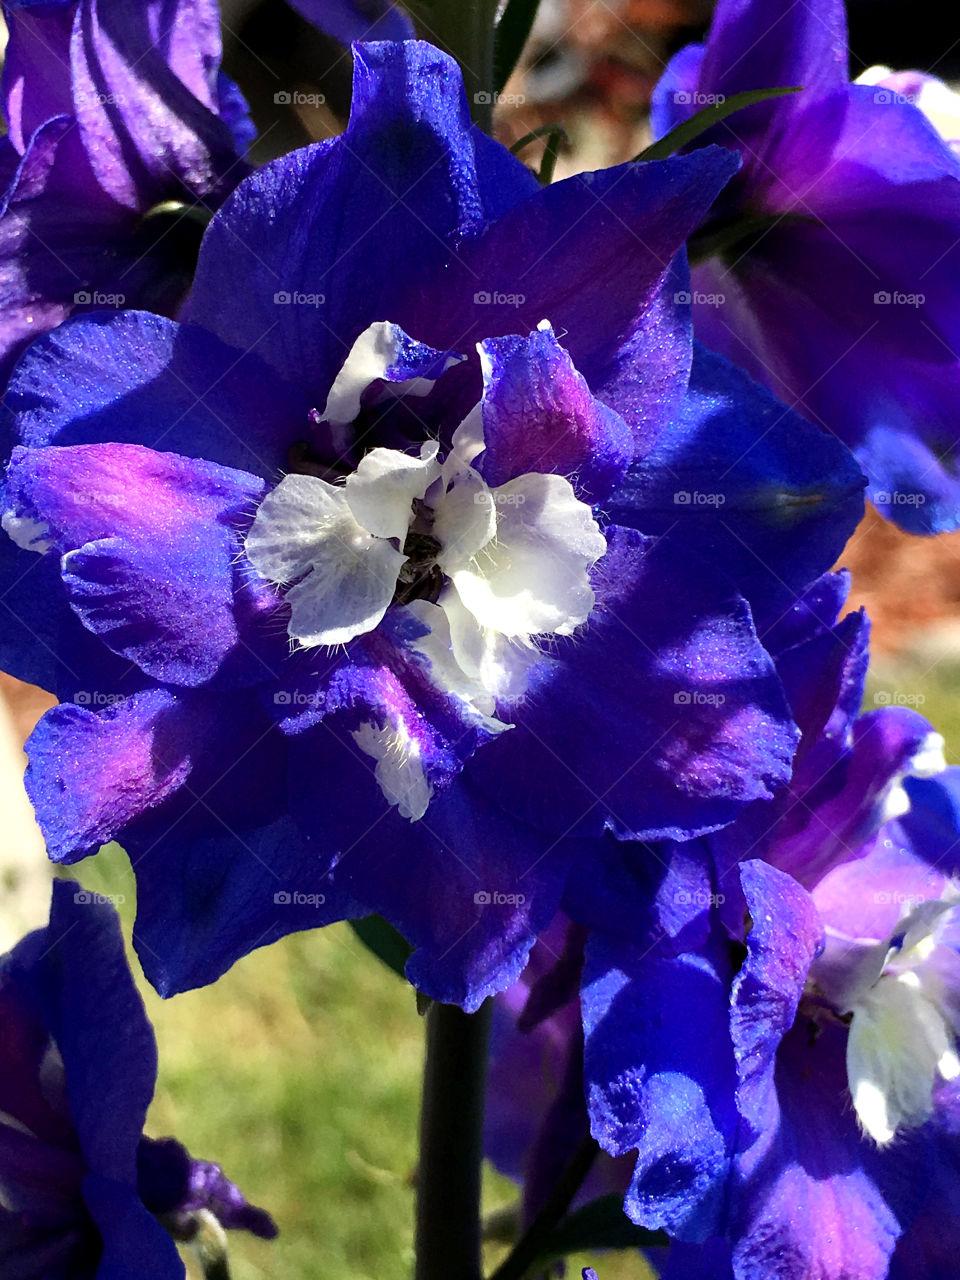 purple and blue Delphiniums sparkle in the sun